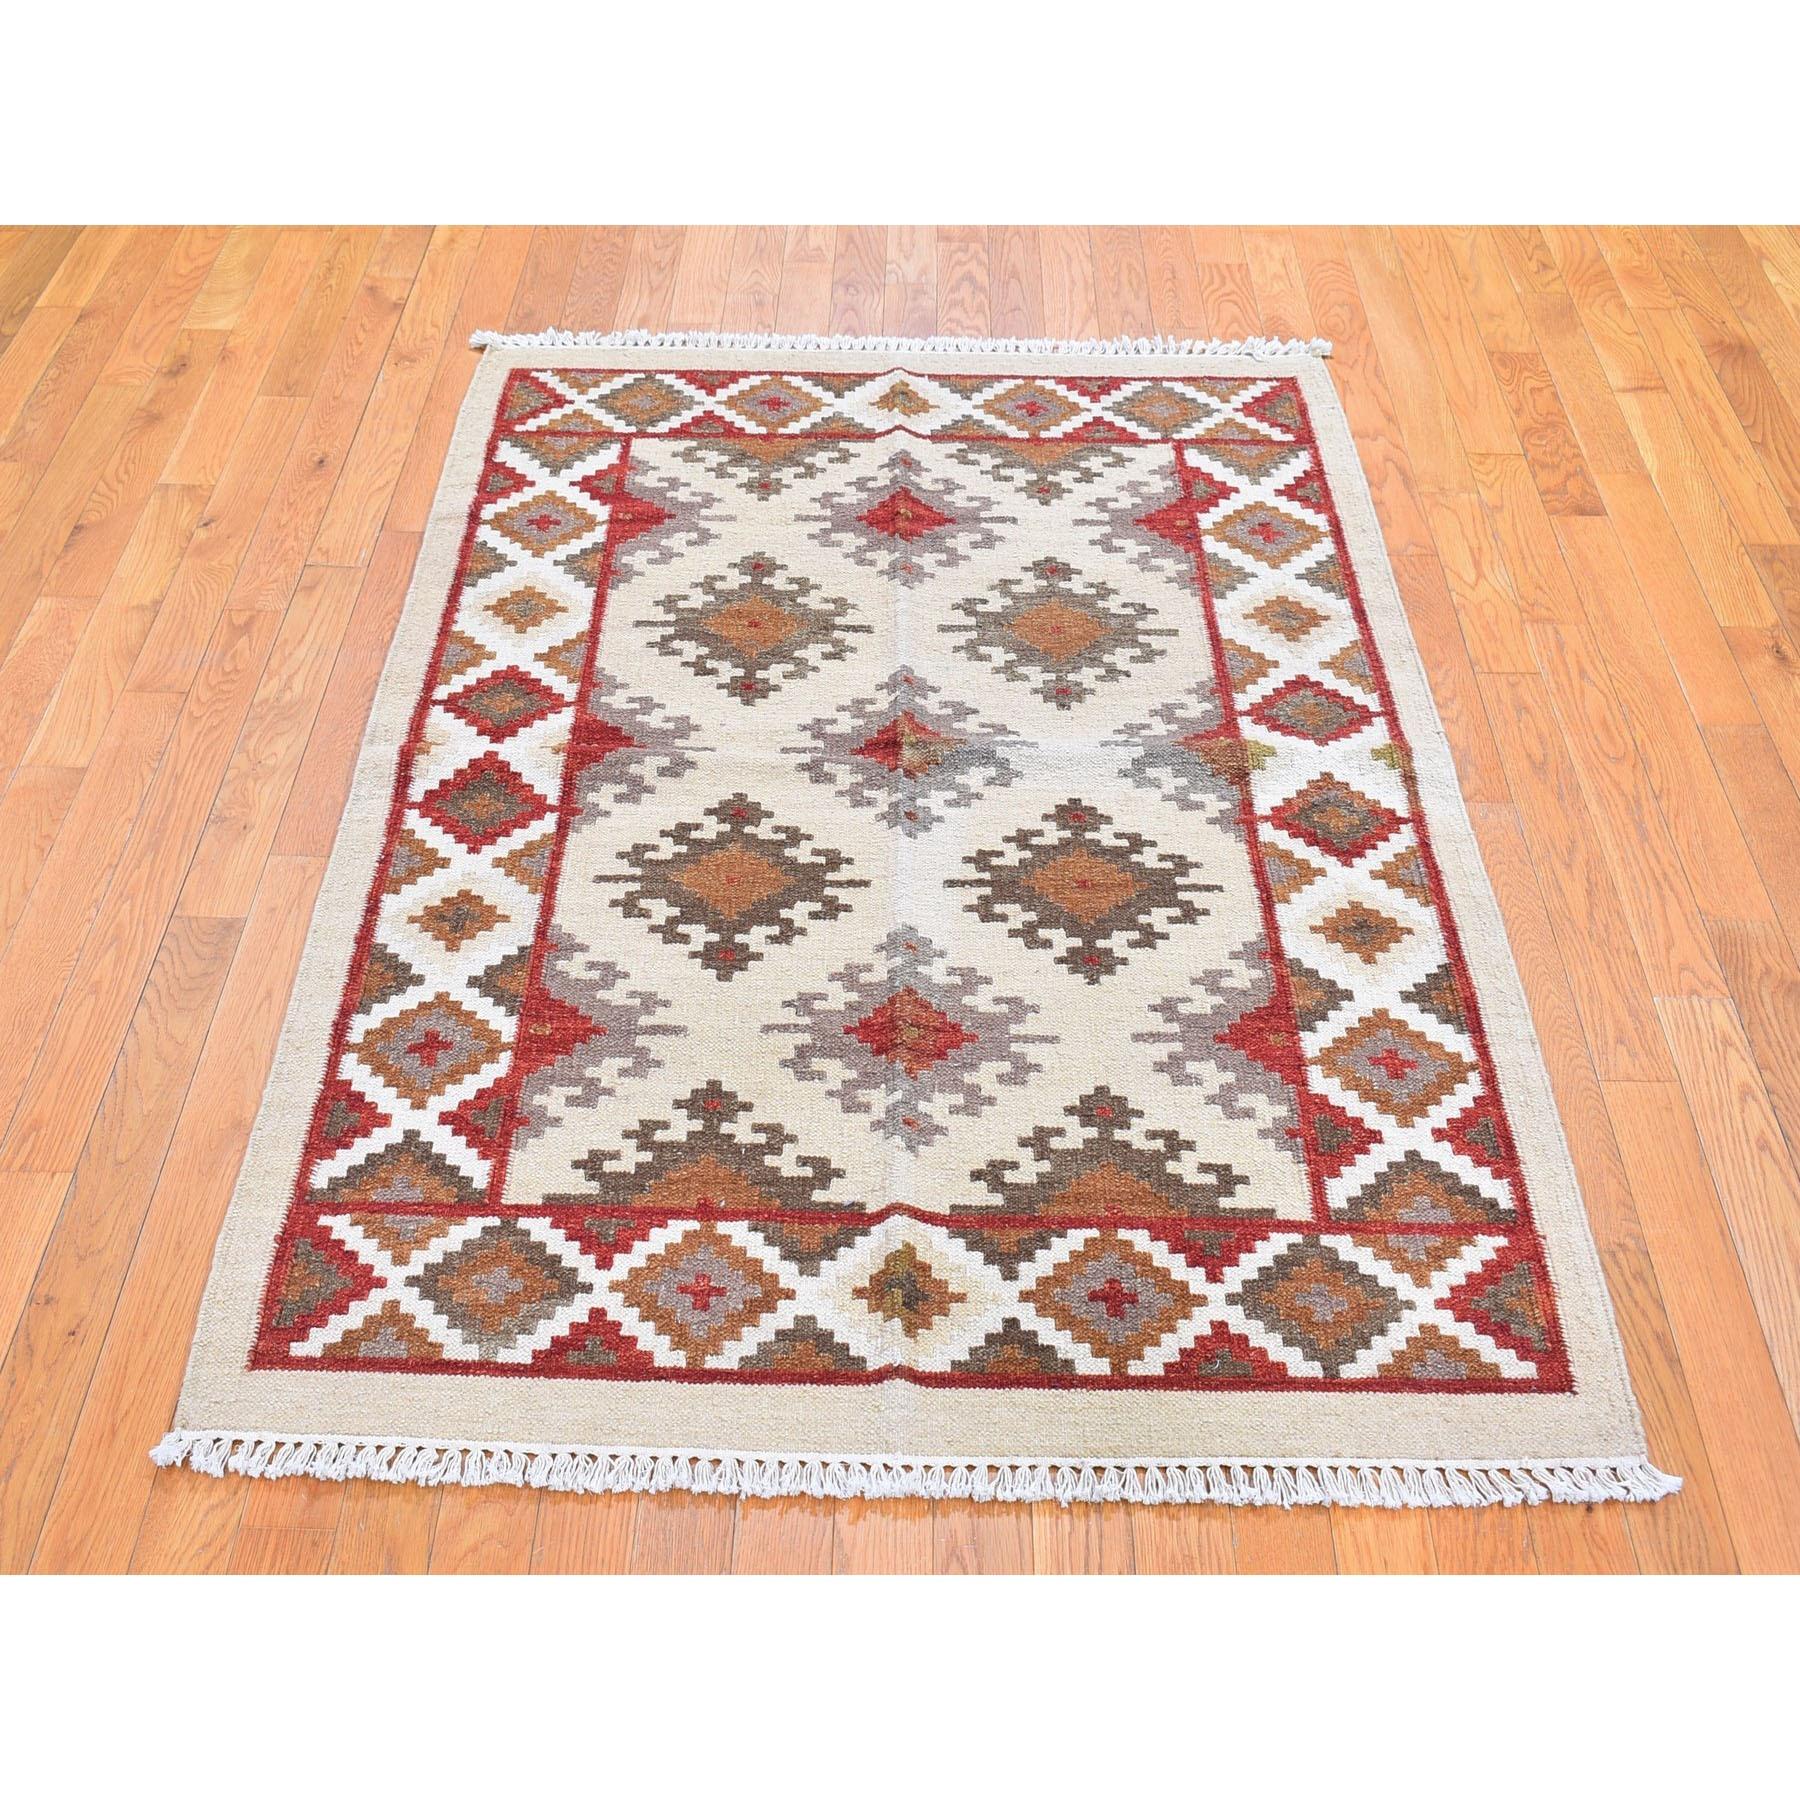 "4'2""x6'1"" Ivory Flat Weave Durie Kilim Geometric Design Pure Wool Hand Woven Oriental Rug"